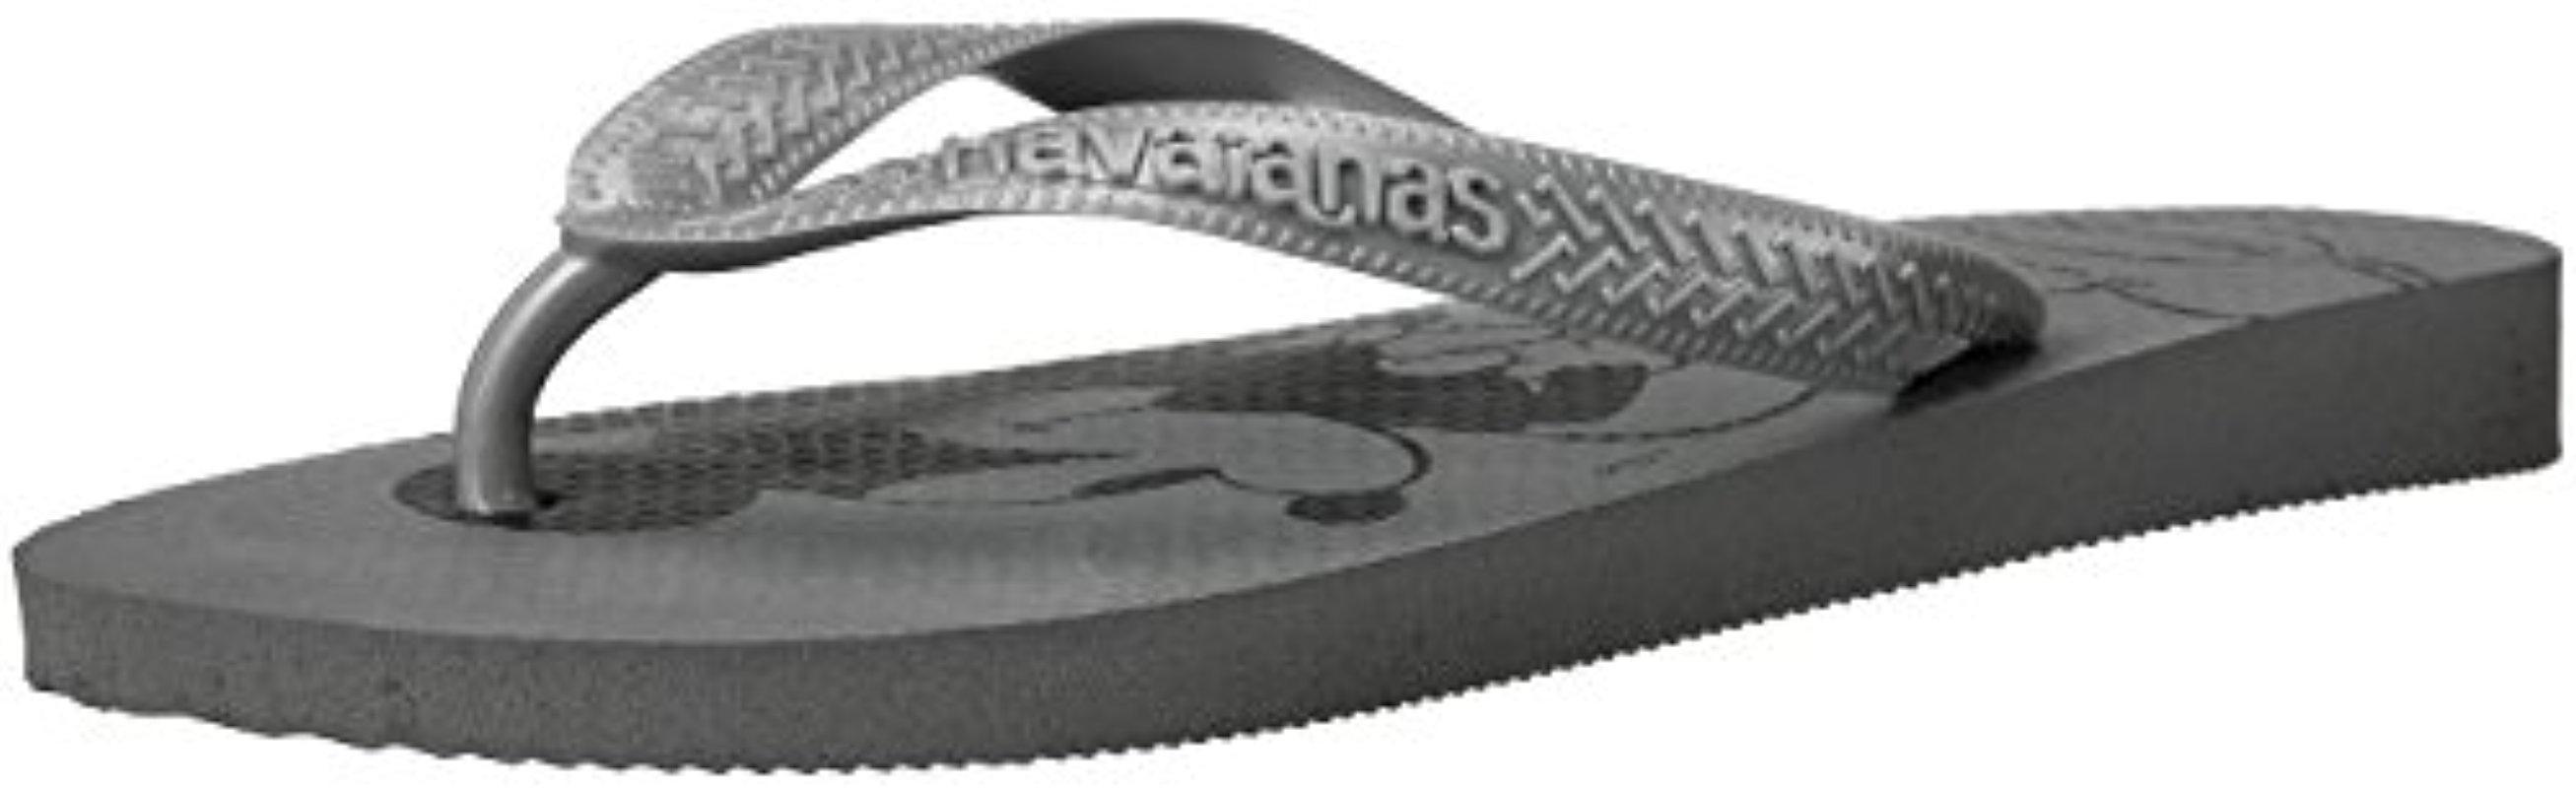 Havaianas Women's Top Tiras Sandal Flip Flop, Steel Grey, 41 BR/11/12 W US